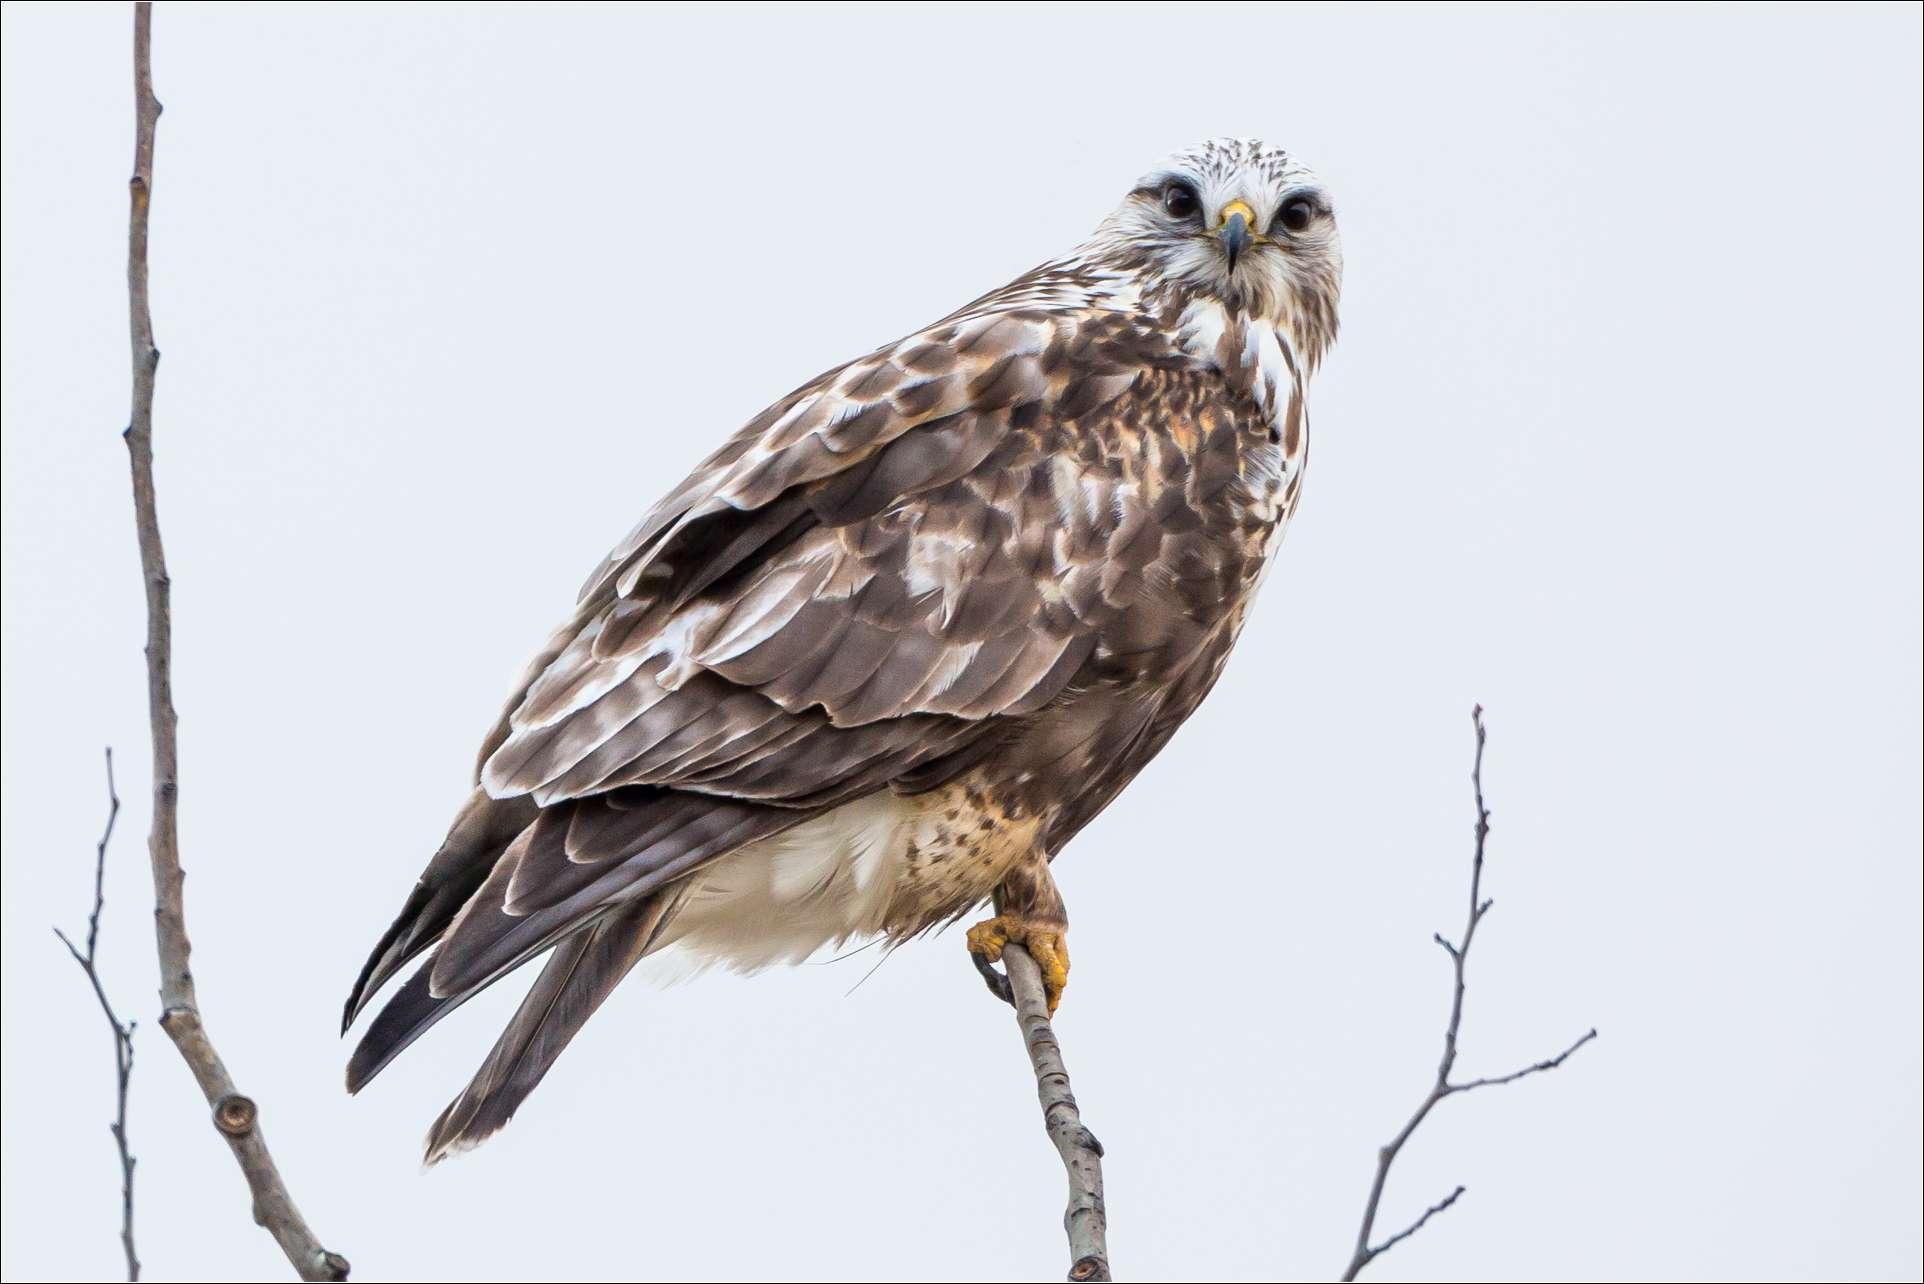 Hawks | Christopher Martin Photography | 1924 x 1284 jpeg 127kB